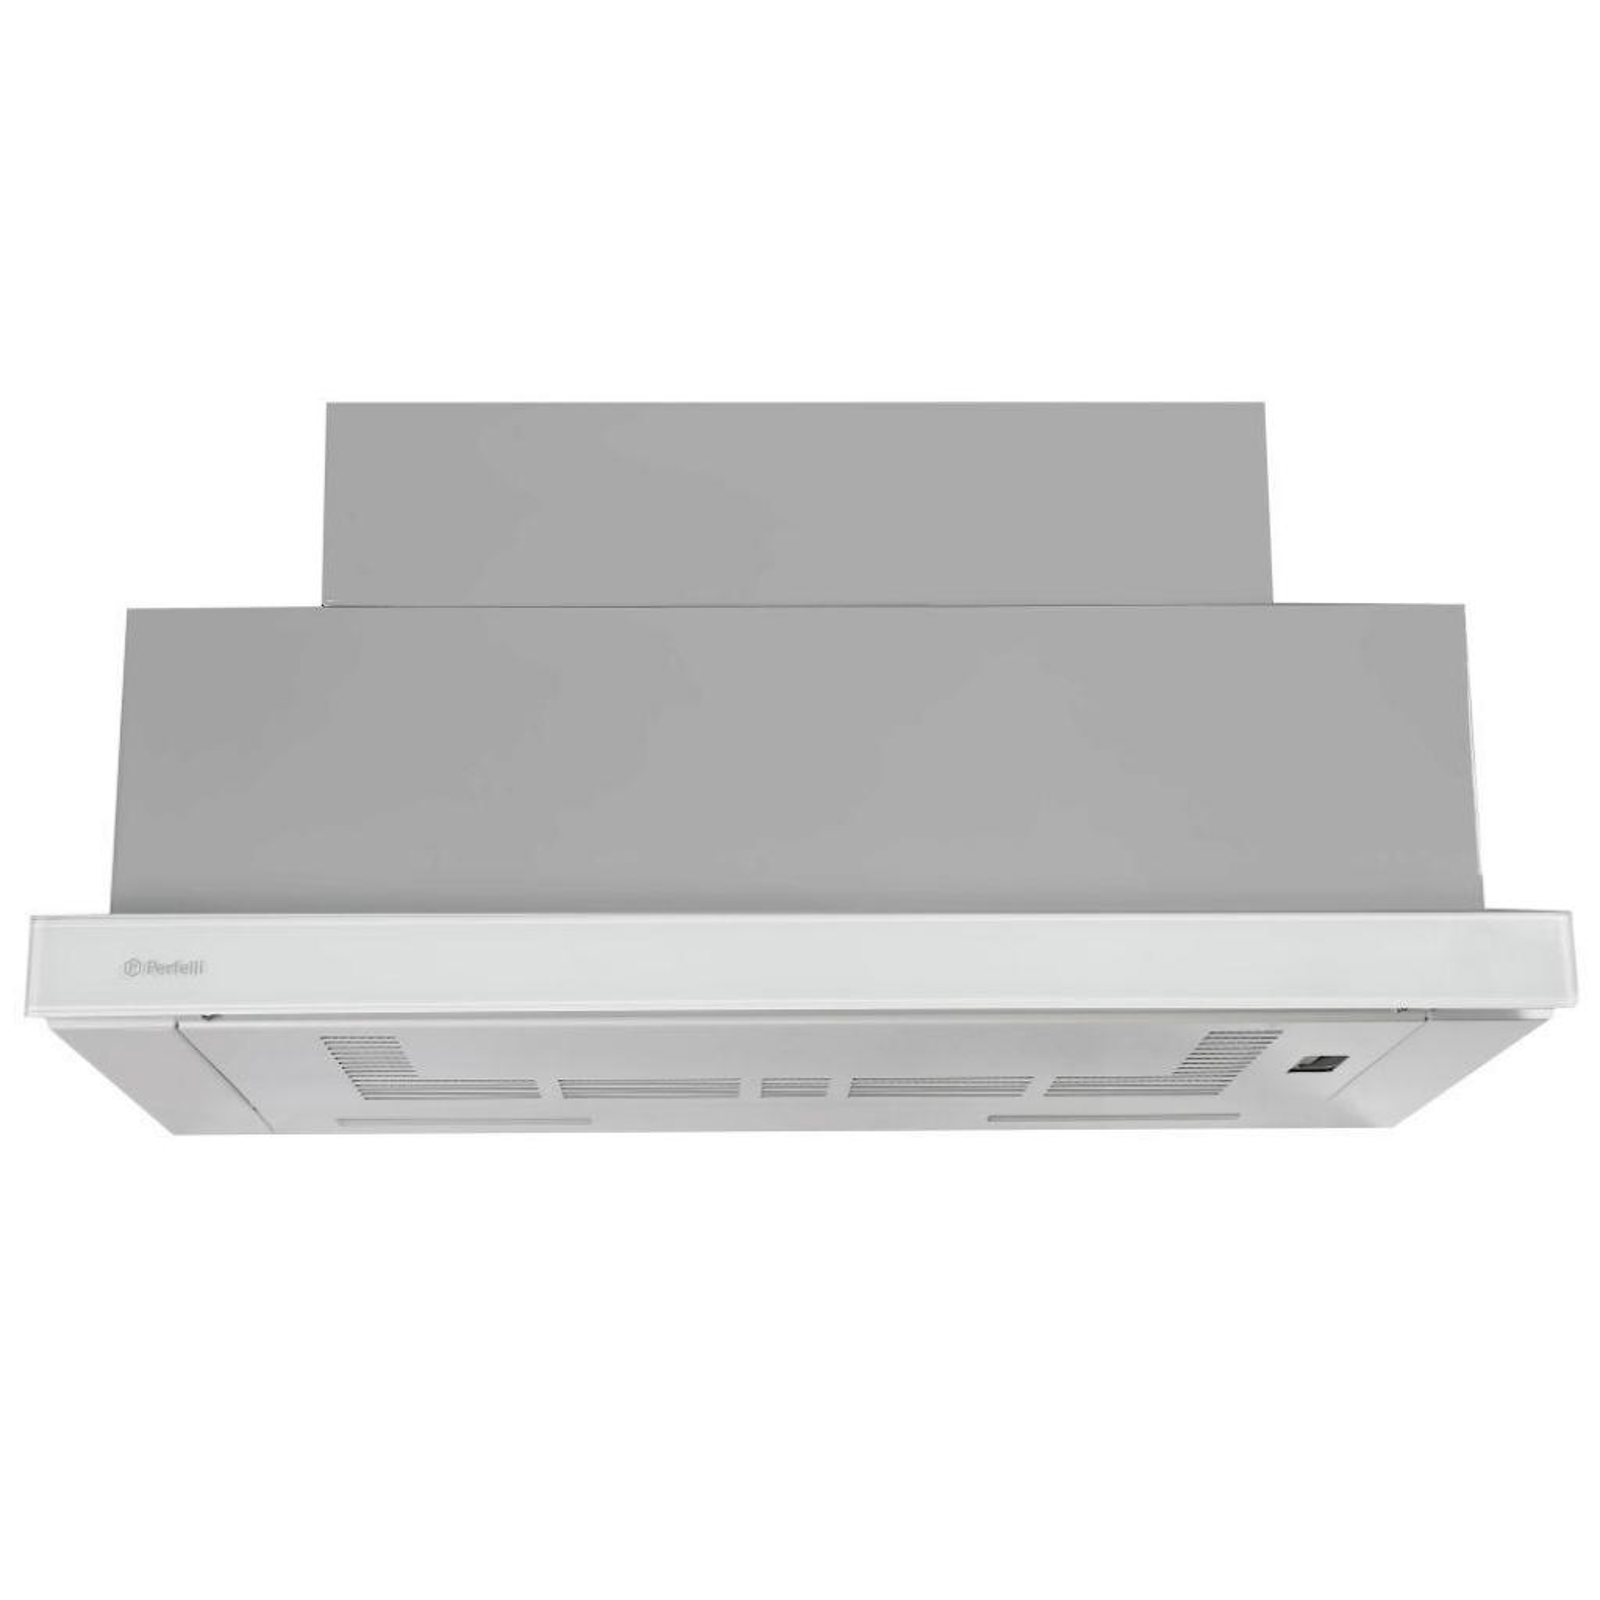 Вытяжка кухонная PERFELLI TLS 6833 W LED Strip изображение 2